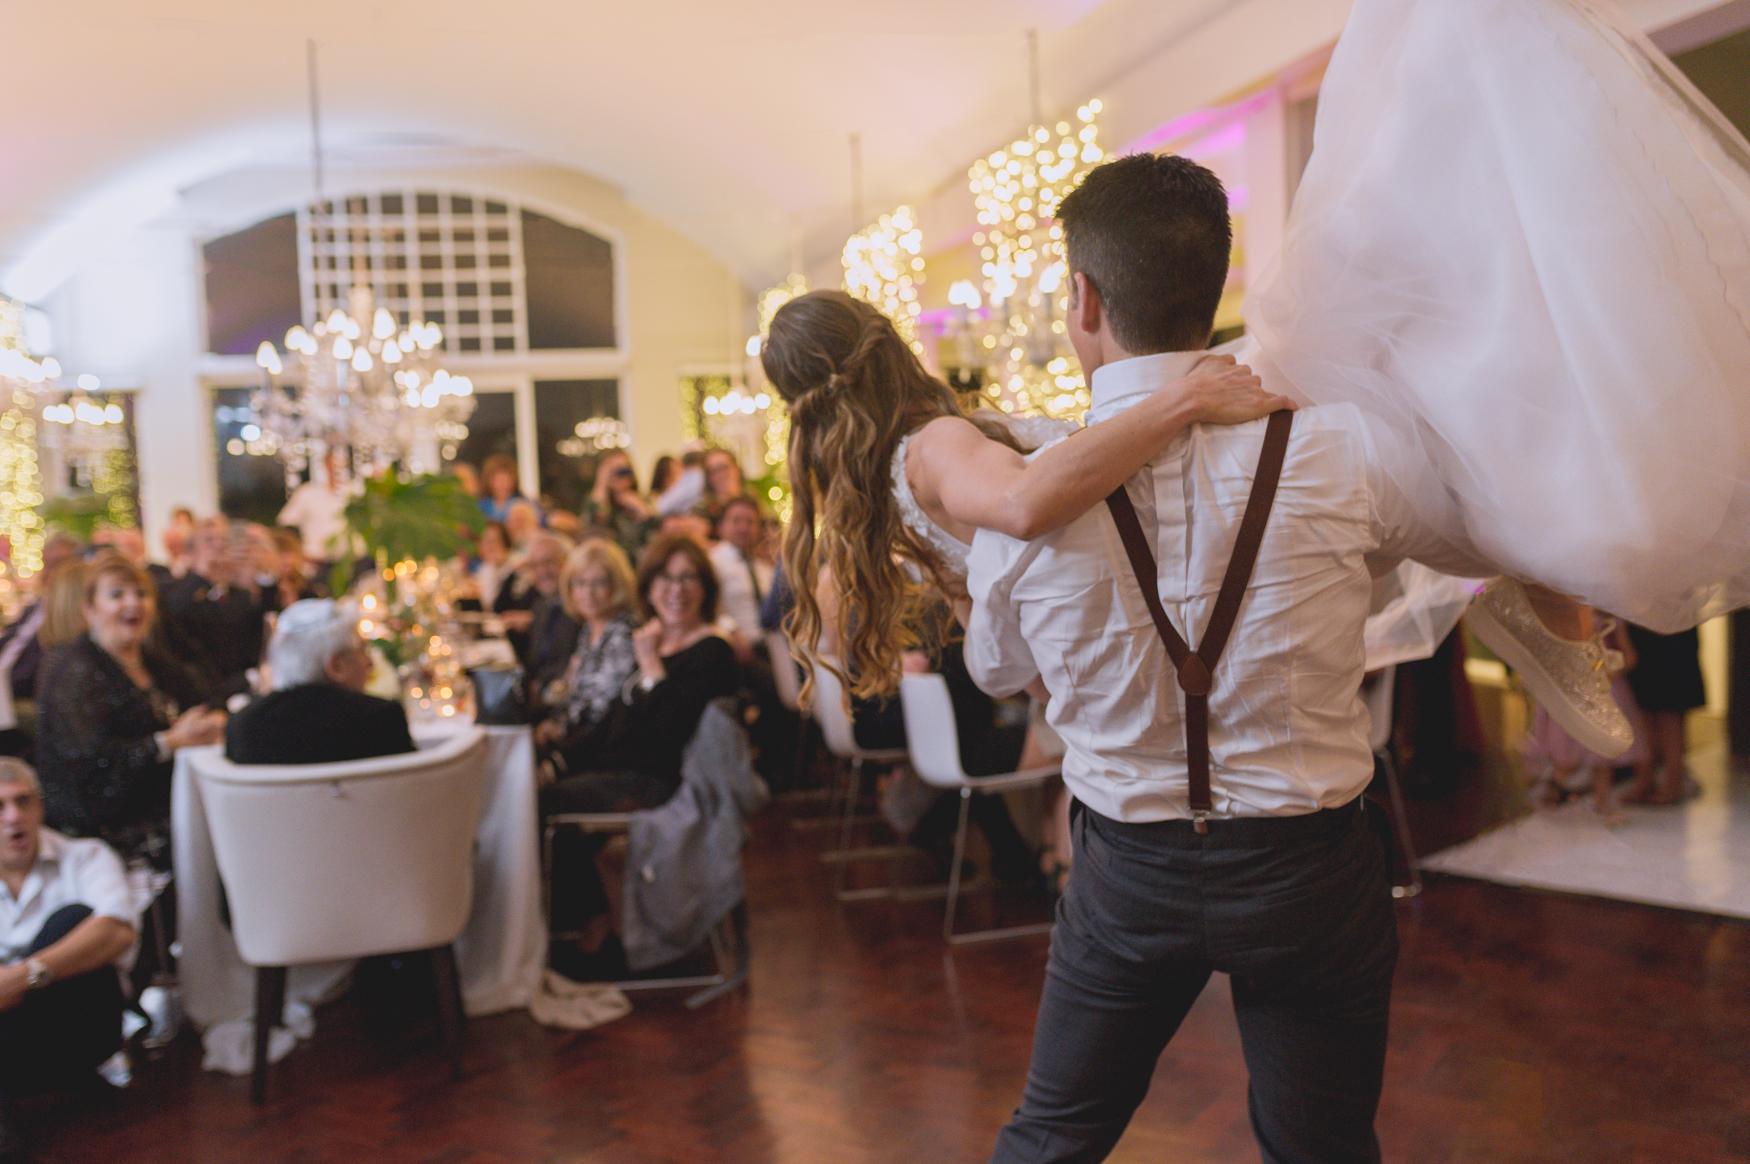 Leon_&_Martine's_Wedding_Photographs_17th_April_2019_@johnhenryweddingphoto_Low_Resolution_Web-558.JPG